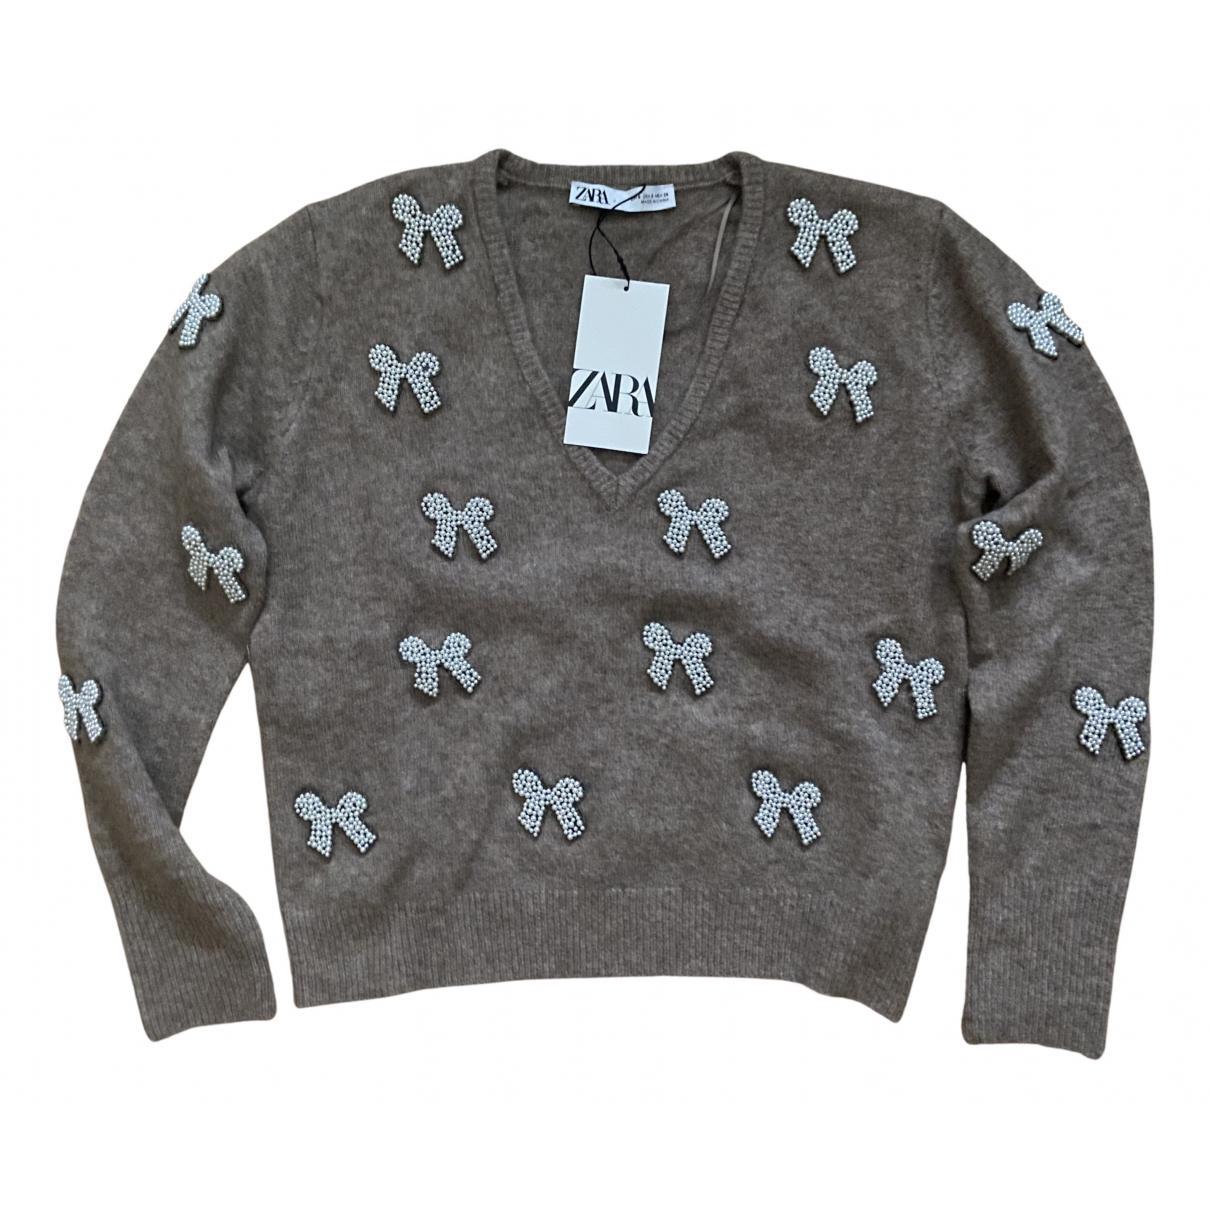 Zara - Pull   pour femme en laine - marron